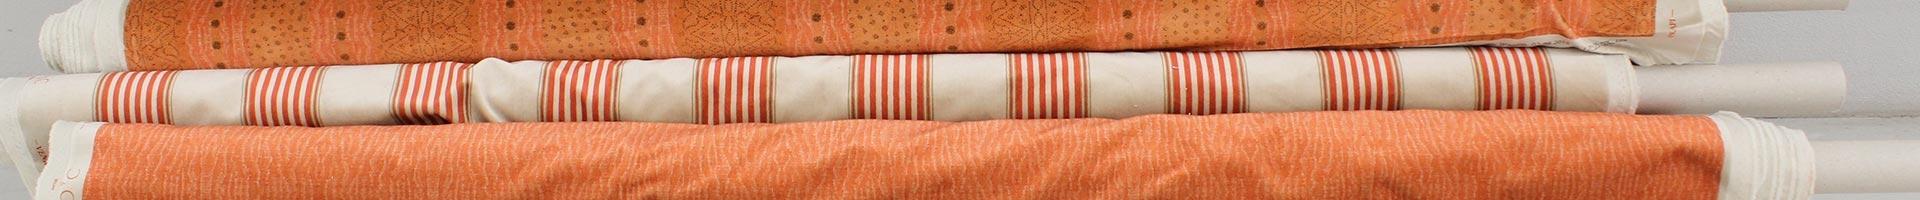 Printed velvet orange tones